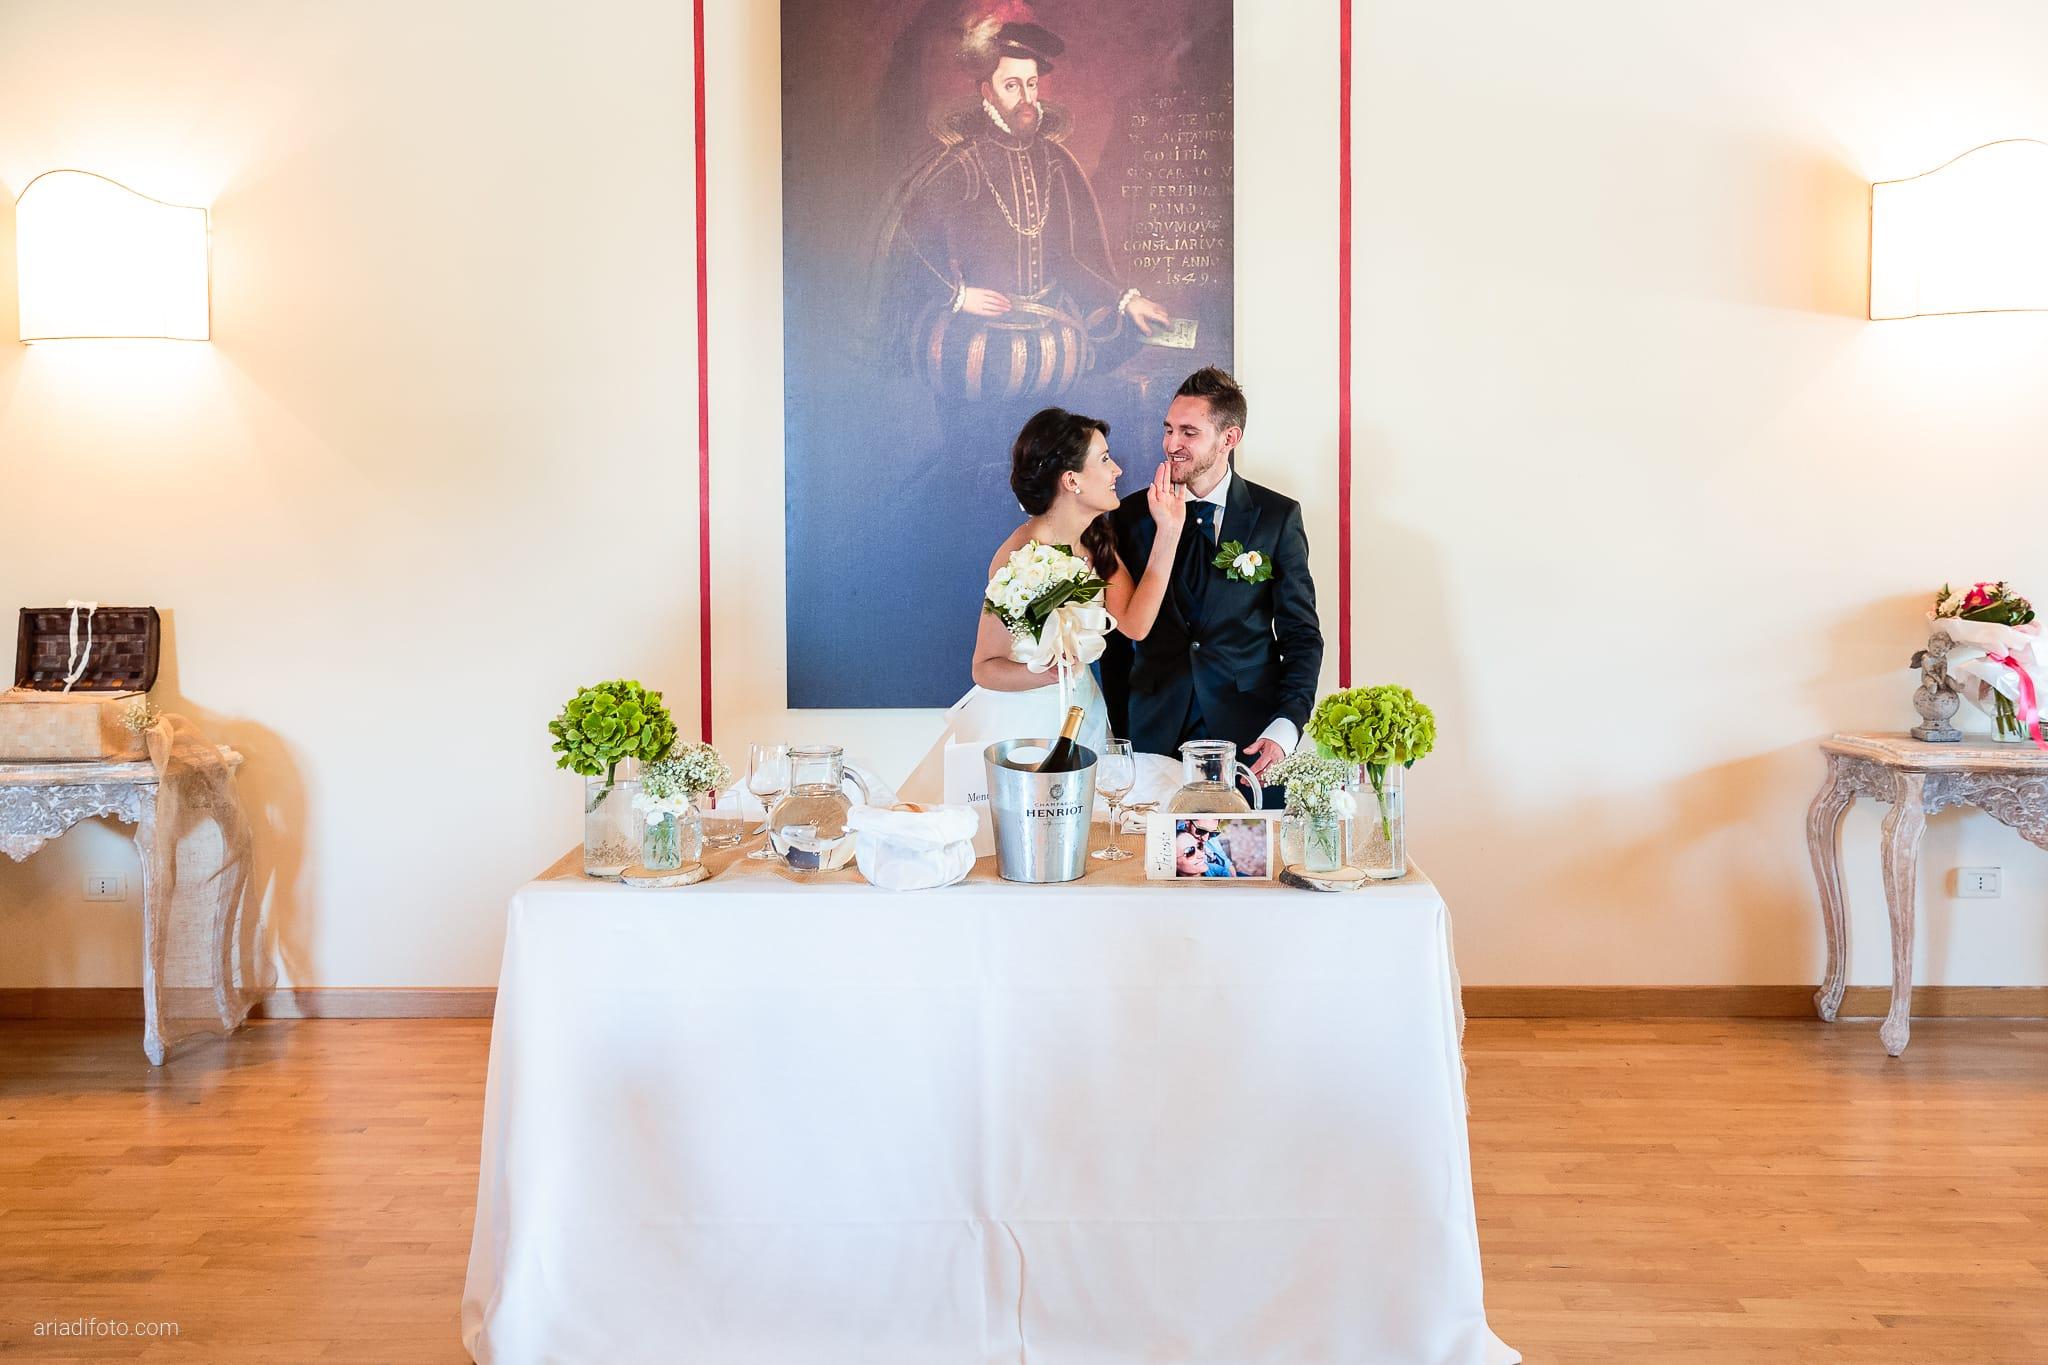 Mariarita Matteo Matrimonio Trieste Villa Attems Cernozza Postcastro Lucinico Gorizia ricevimento ingresso